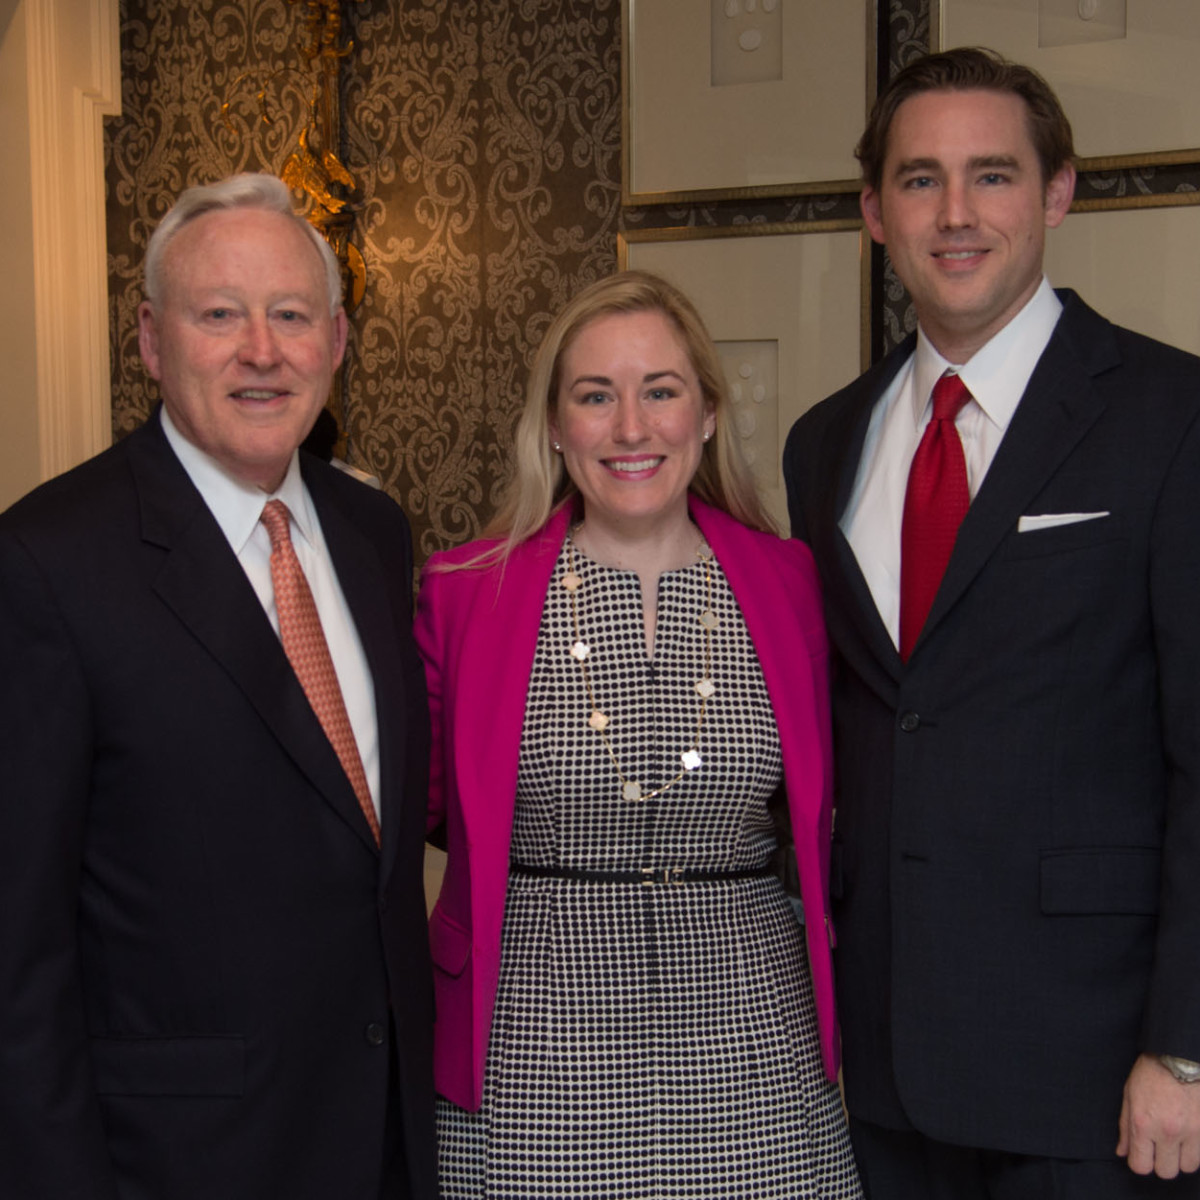 News, Shelby, Houston Bar Harvest Party, Nov. 2015, Fred Hagans, Lindsay Hagans, William Hagans